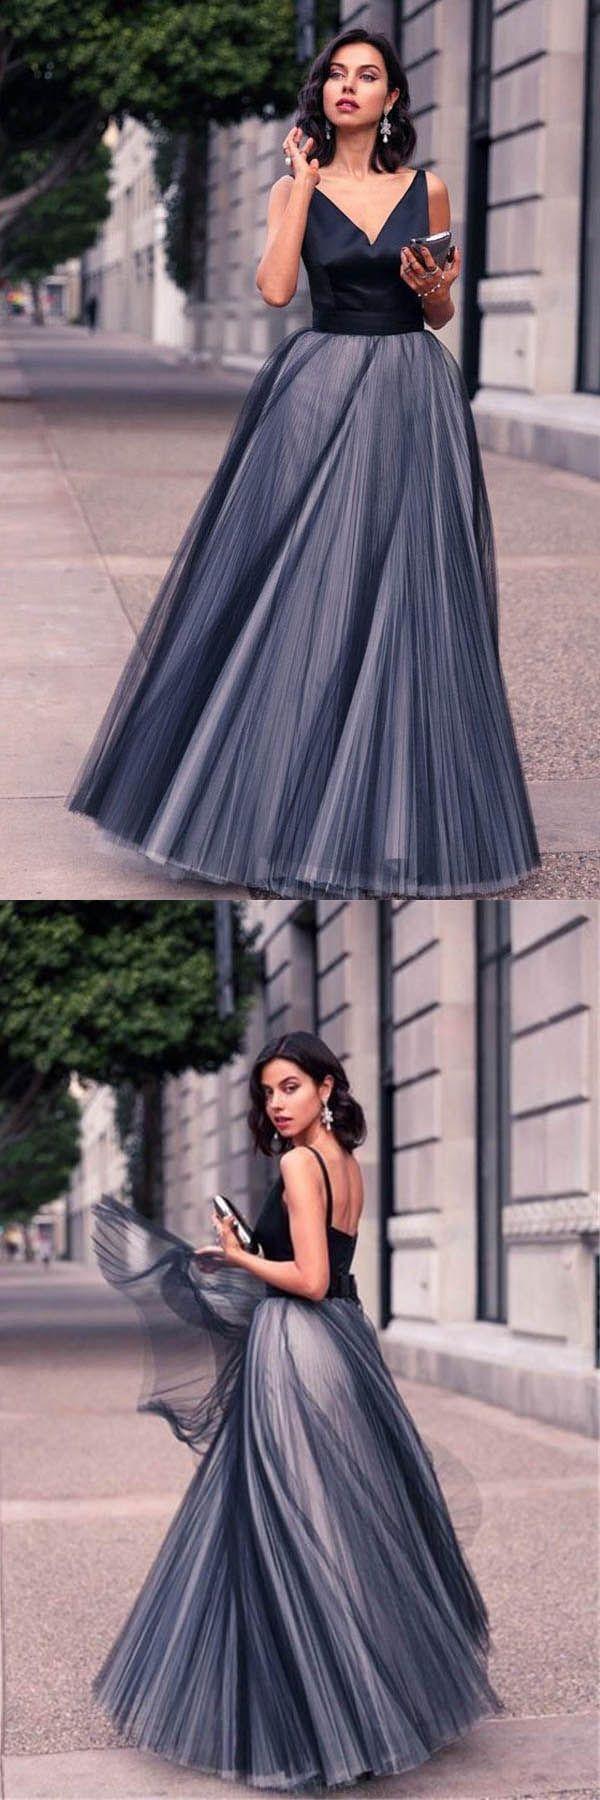 prom dresses promdresses cute prom dresses